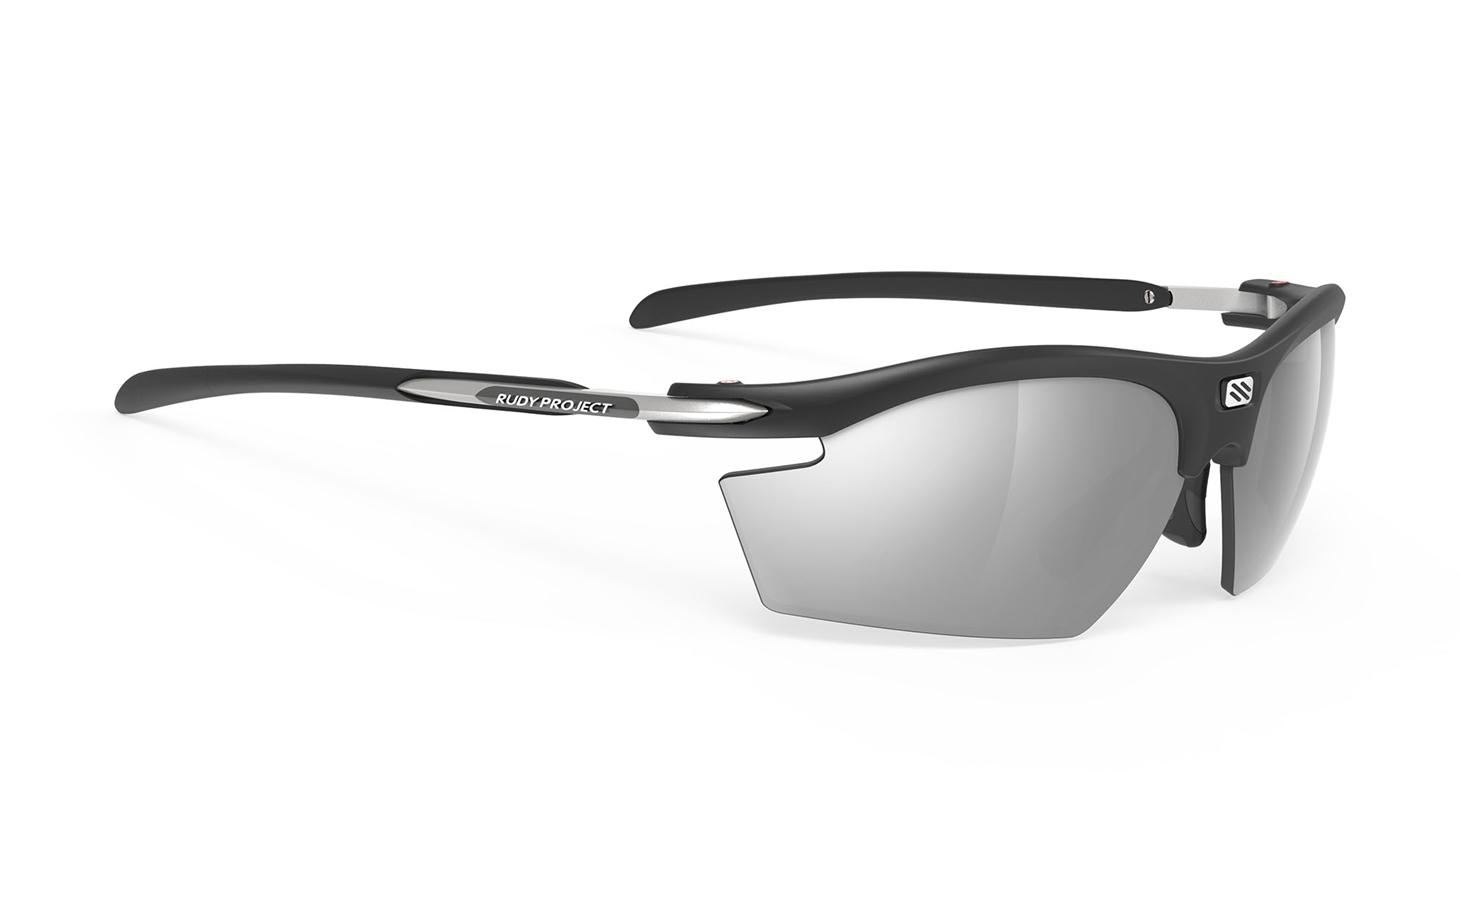 b084ca054d3 Performance Eyewear Rydon - Rudy Project